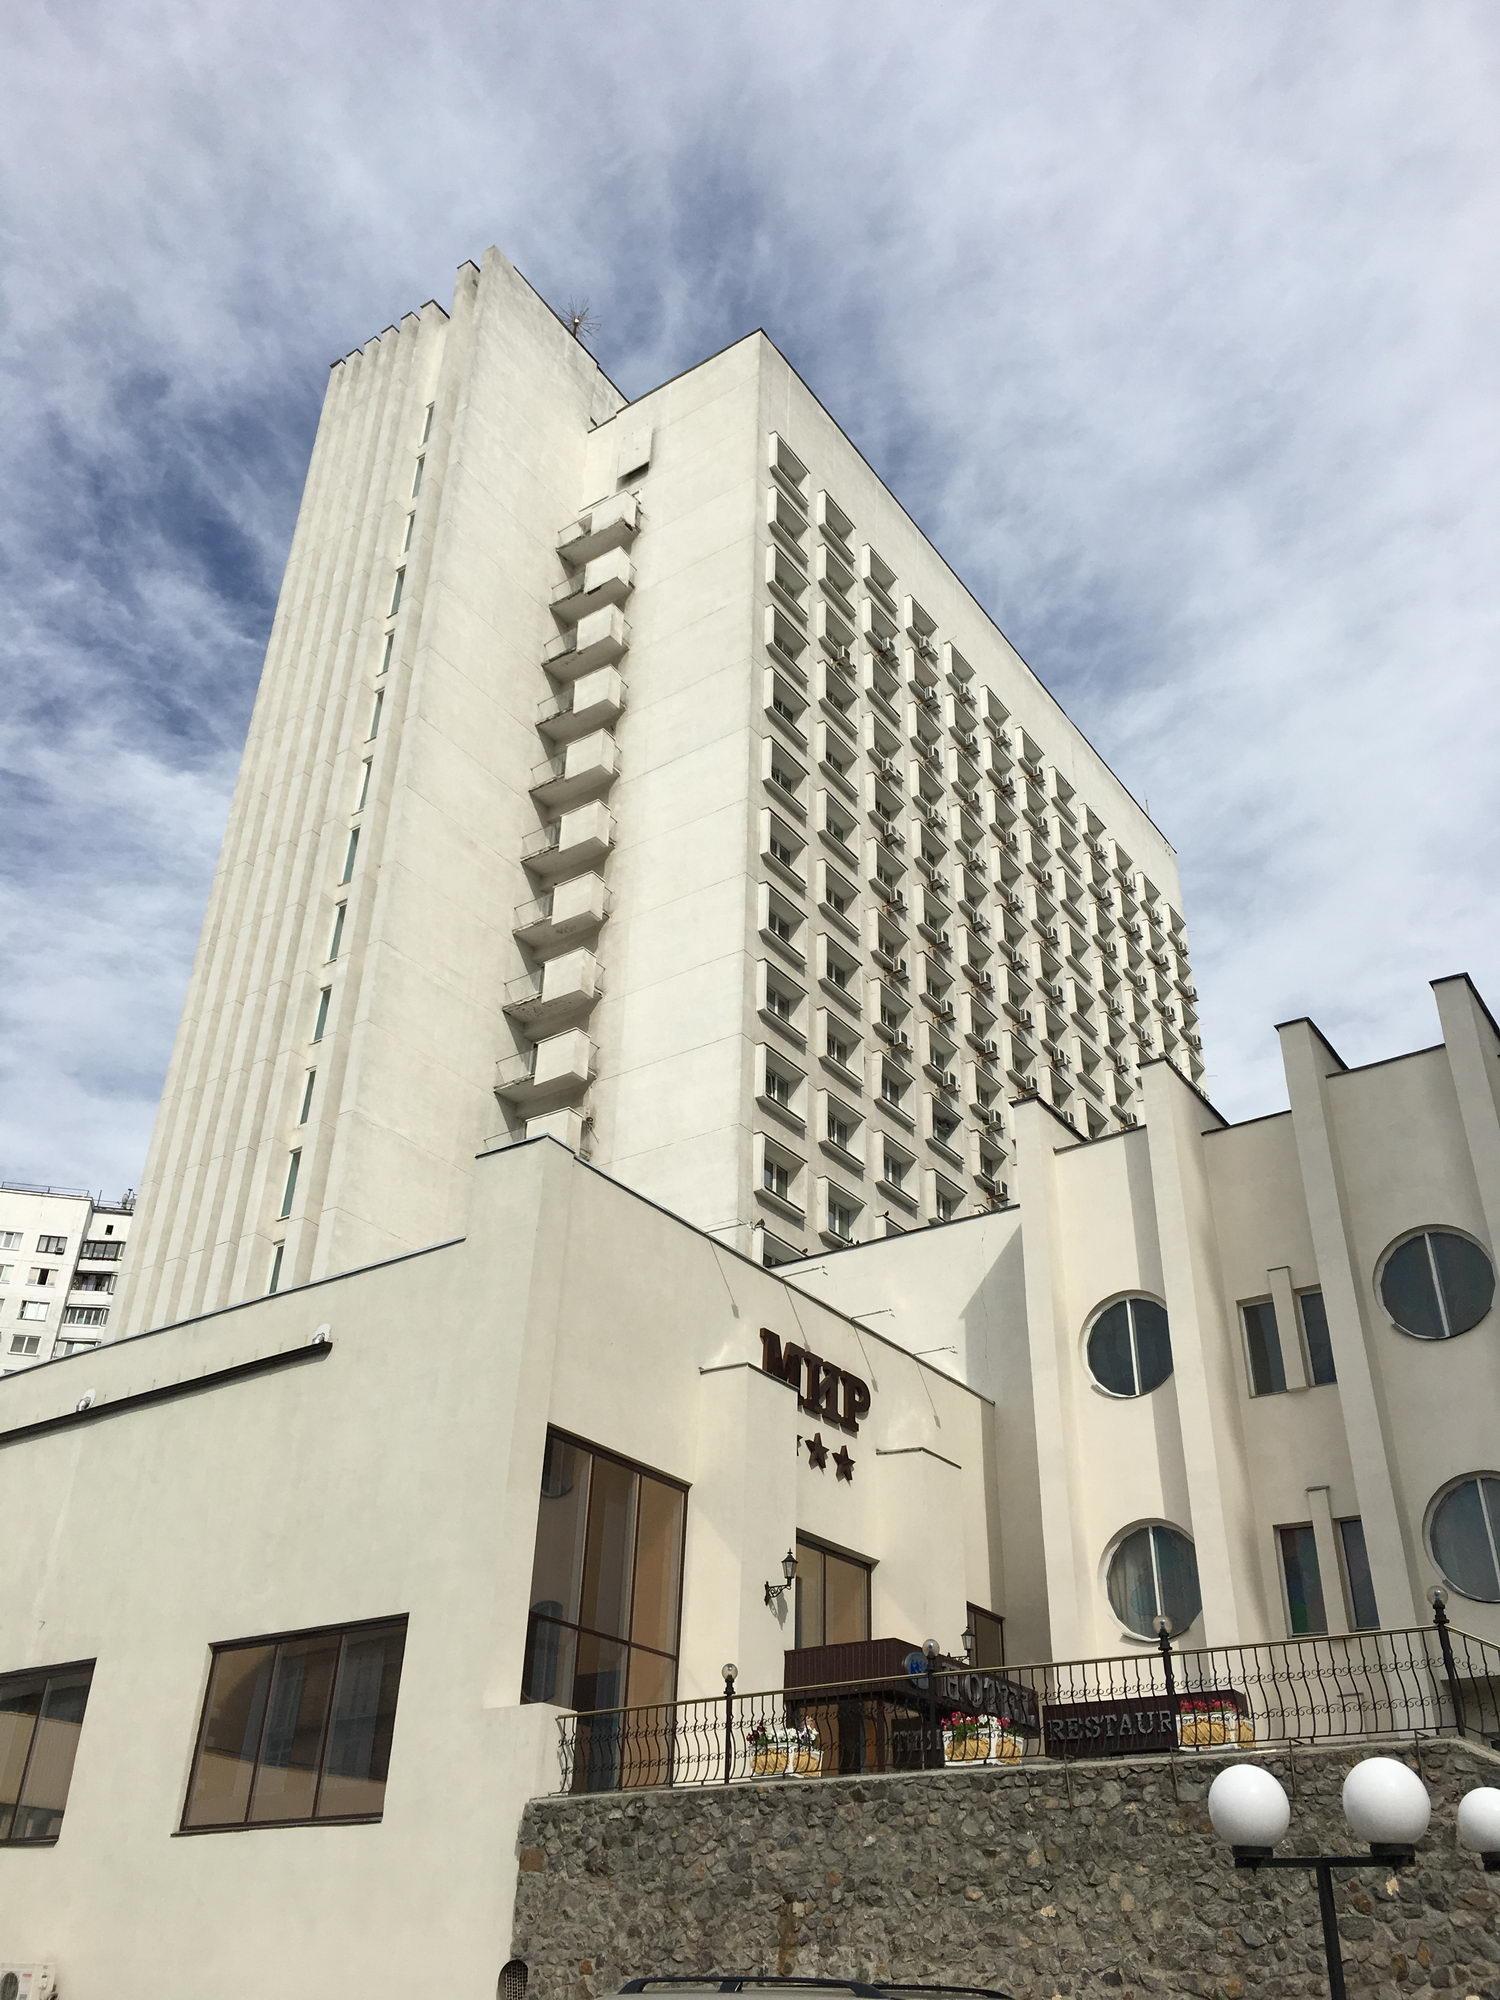 nostalgični hotel Mir v Kijevu